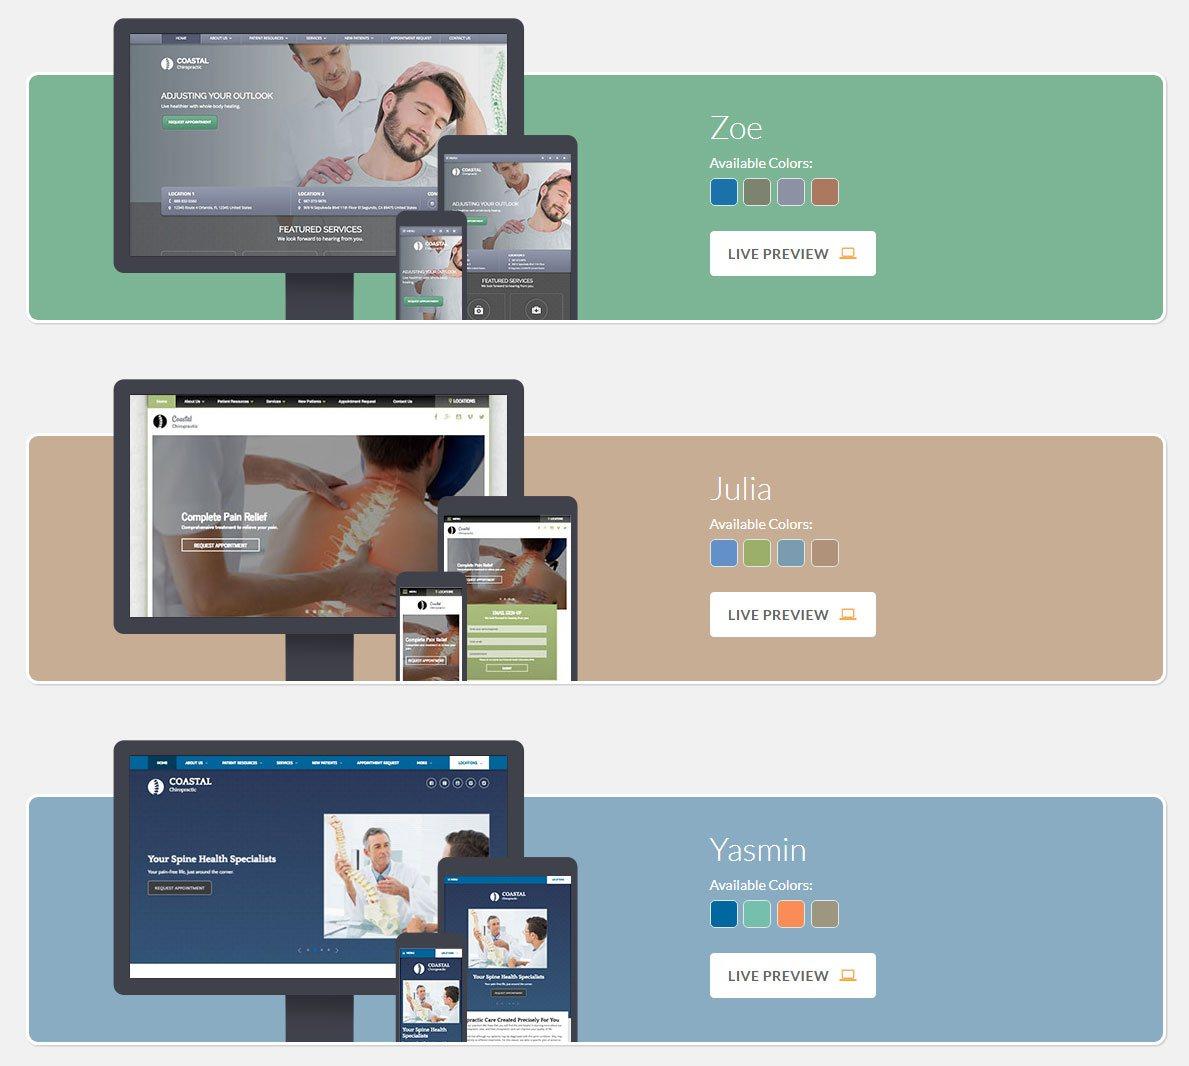 Design Gallery Live Chiropractor Design Gallery Chiropractic Web Design